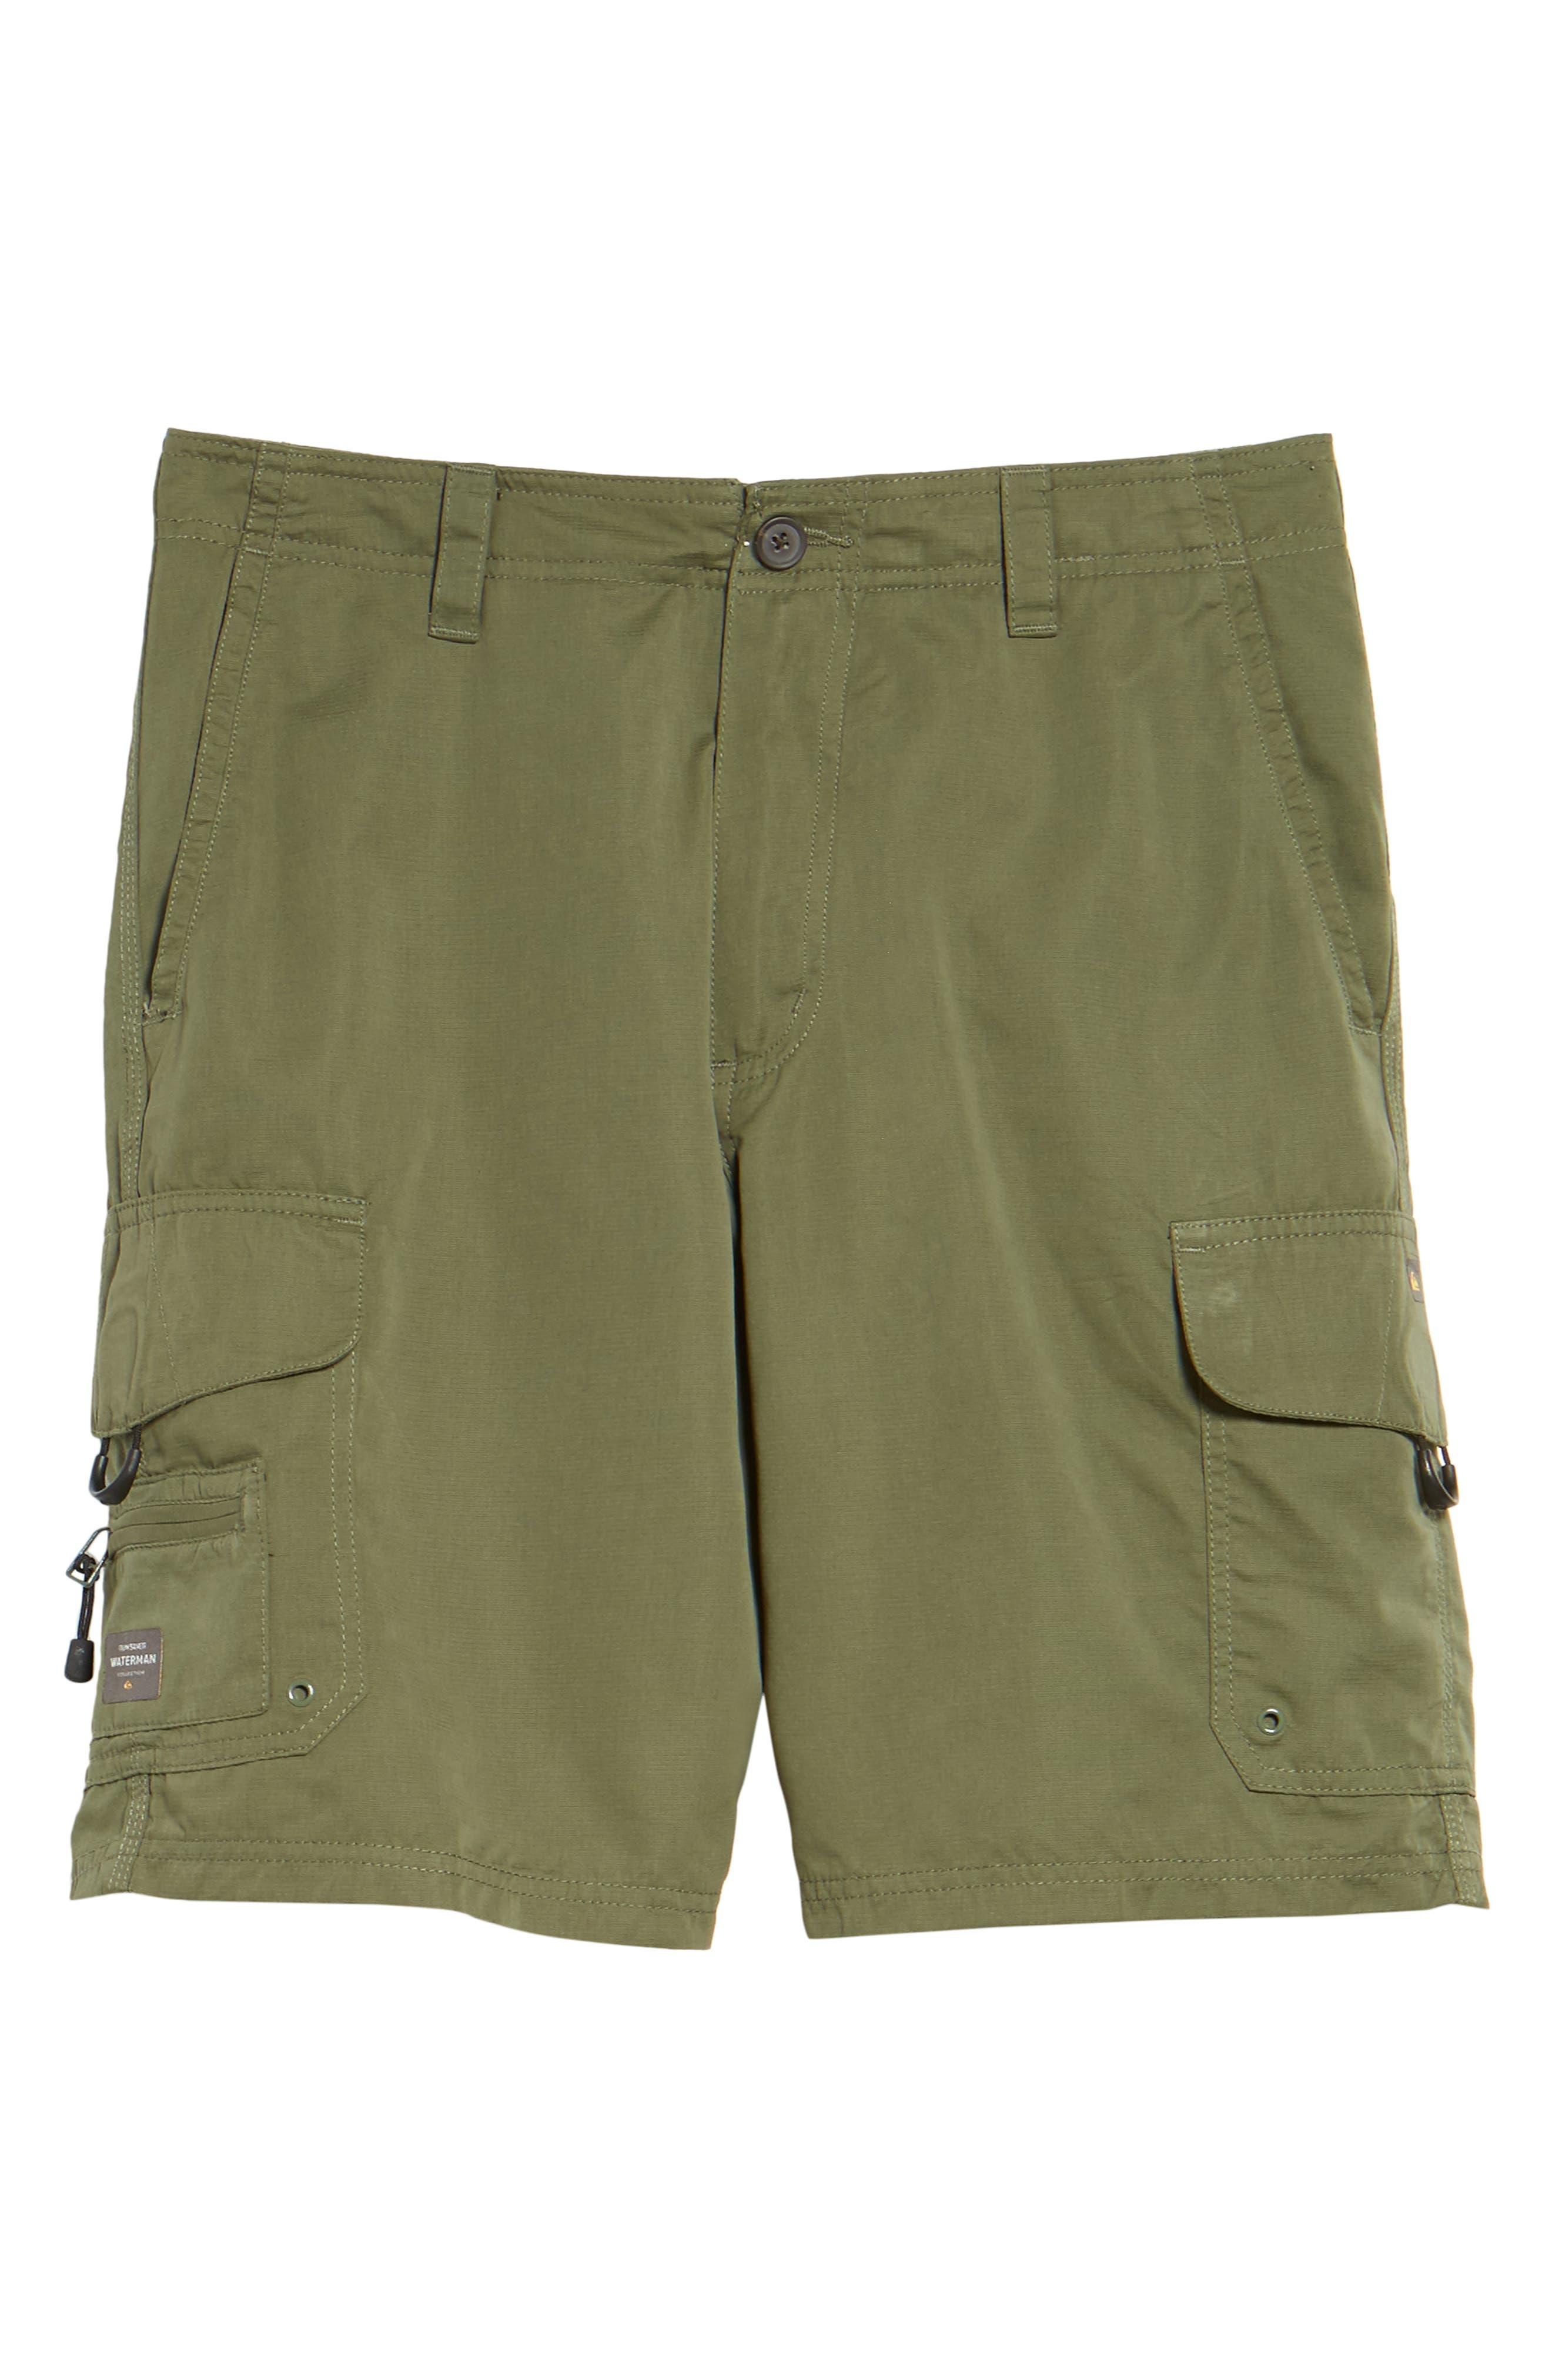 Maldive Cargo Shorts,                             Alternate thumbnail 6, color,                             304